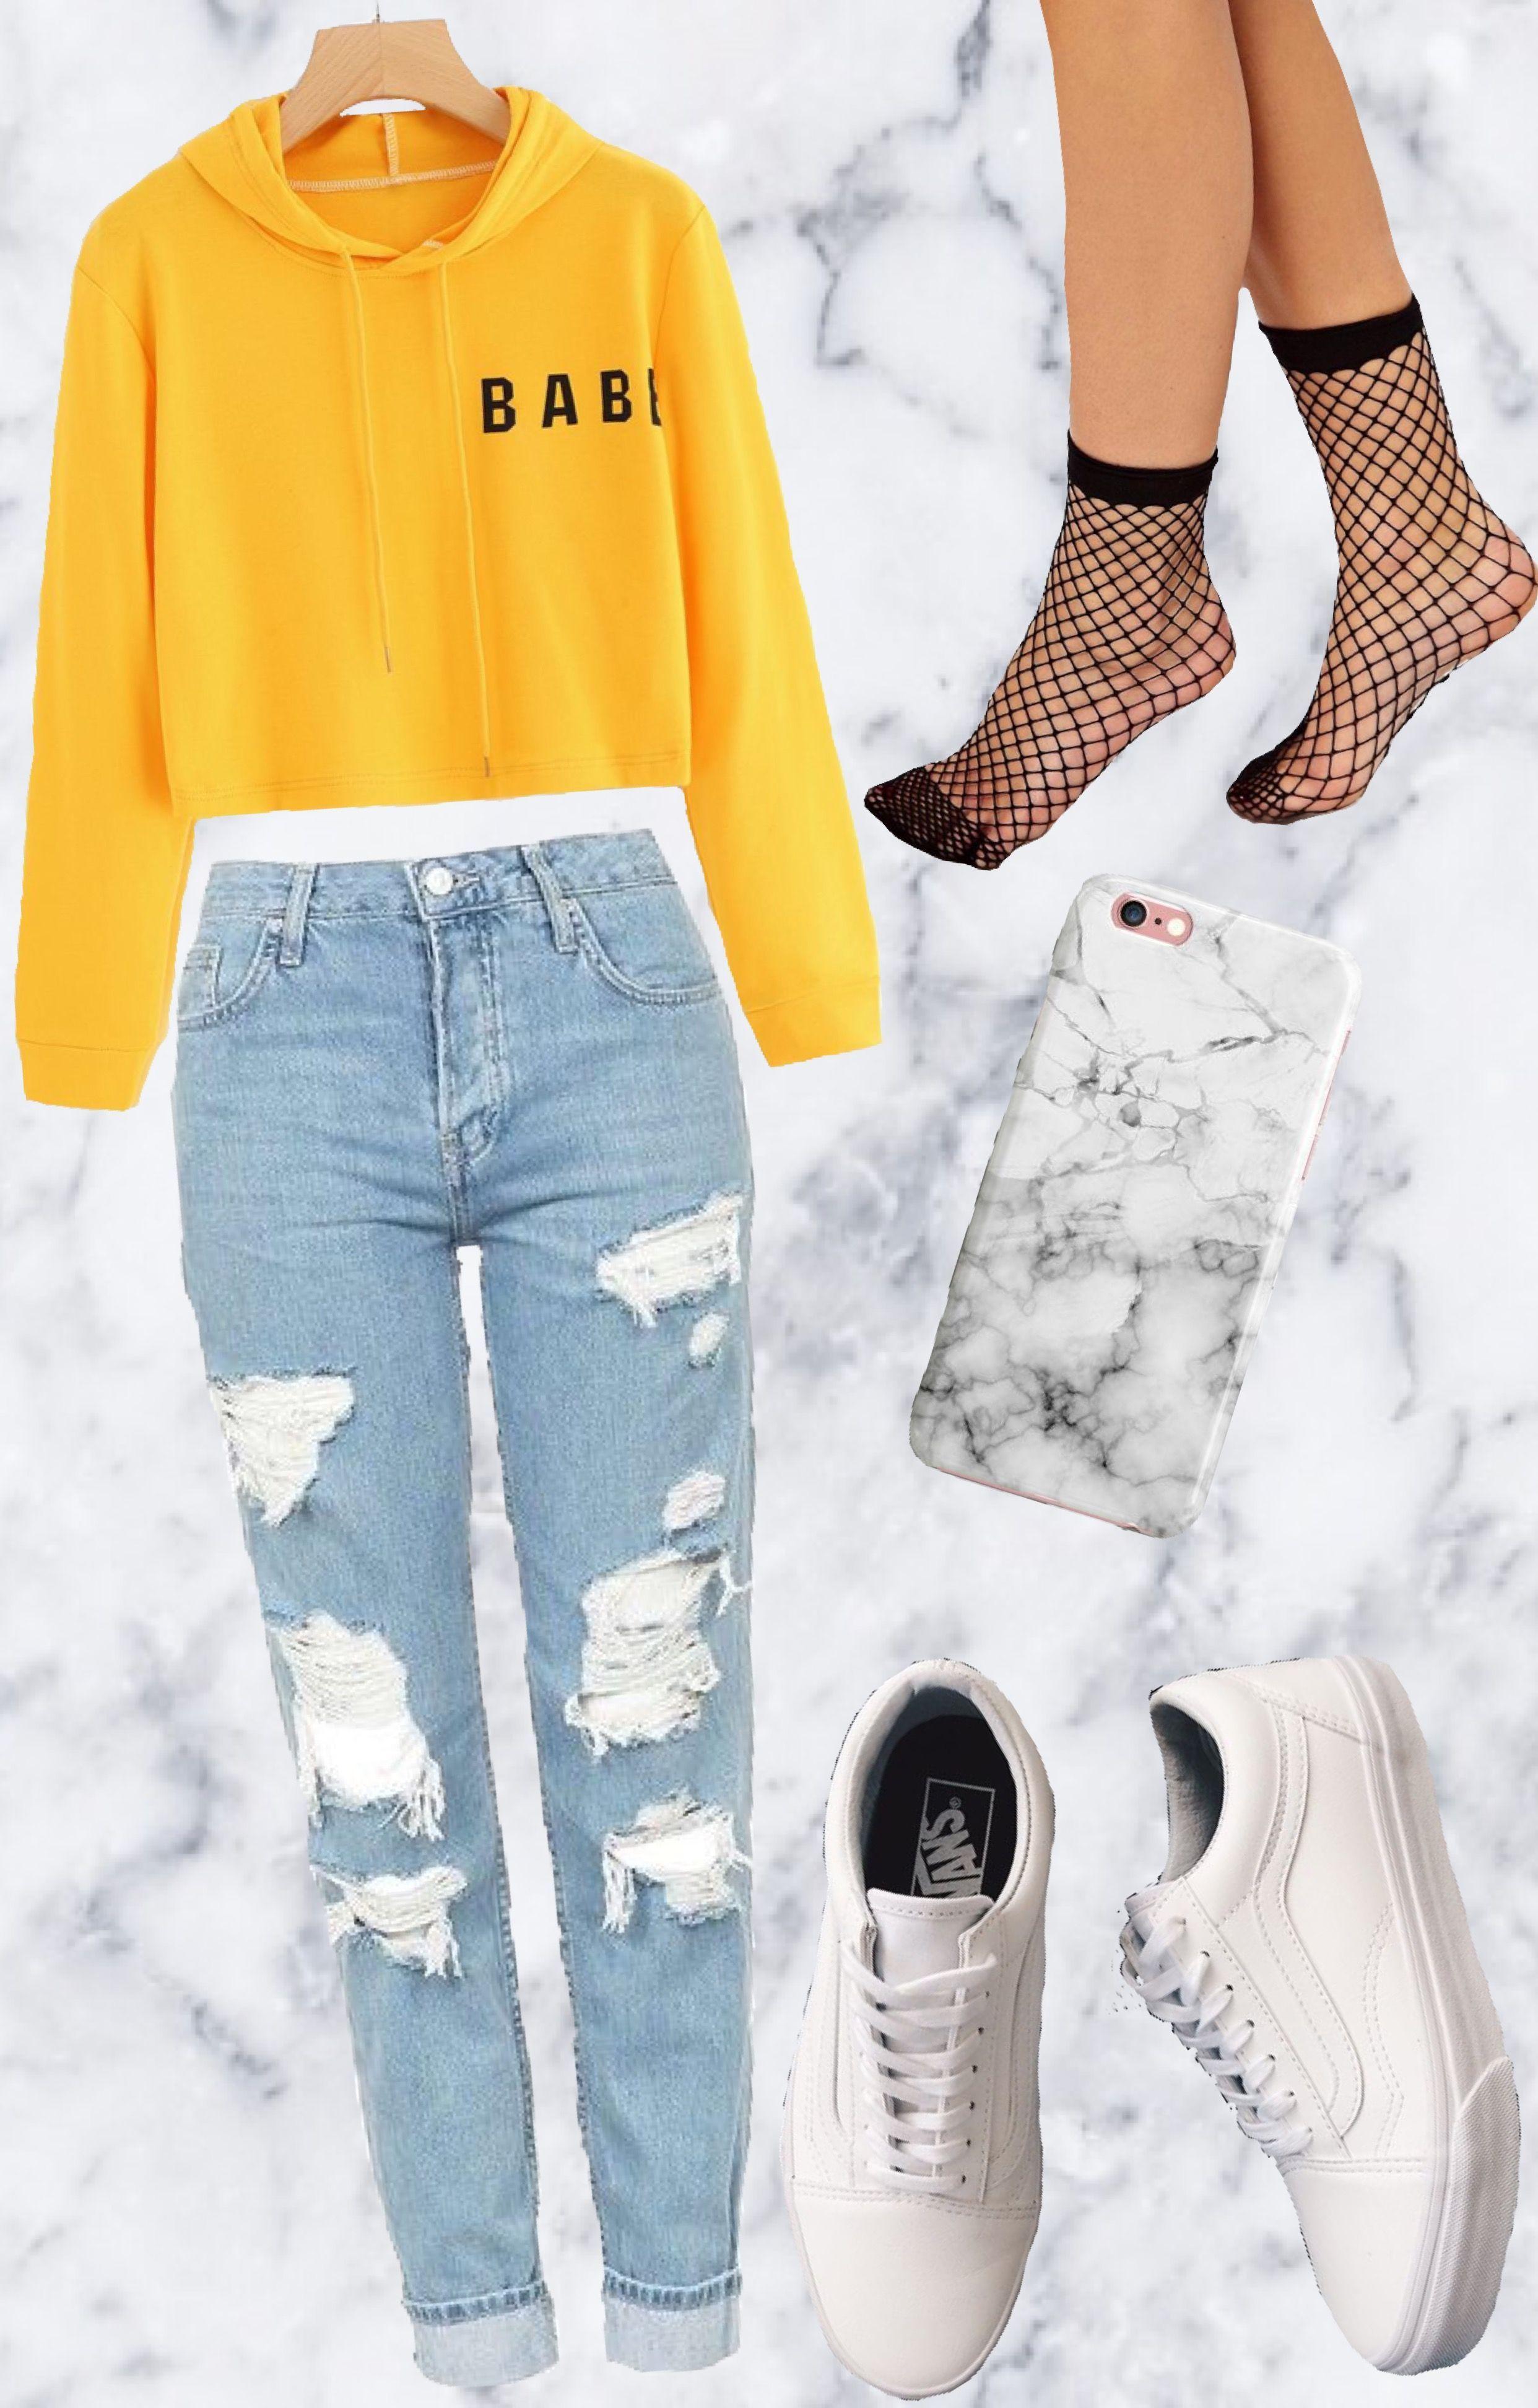 914caa6ecbe1 Yellow Sweat-Shirt . Riped Jeans . Bumpy Socks . White sneakers . This  modern look